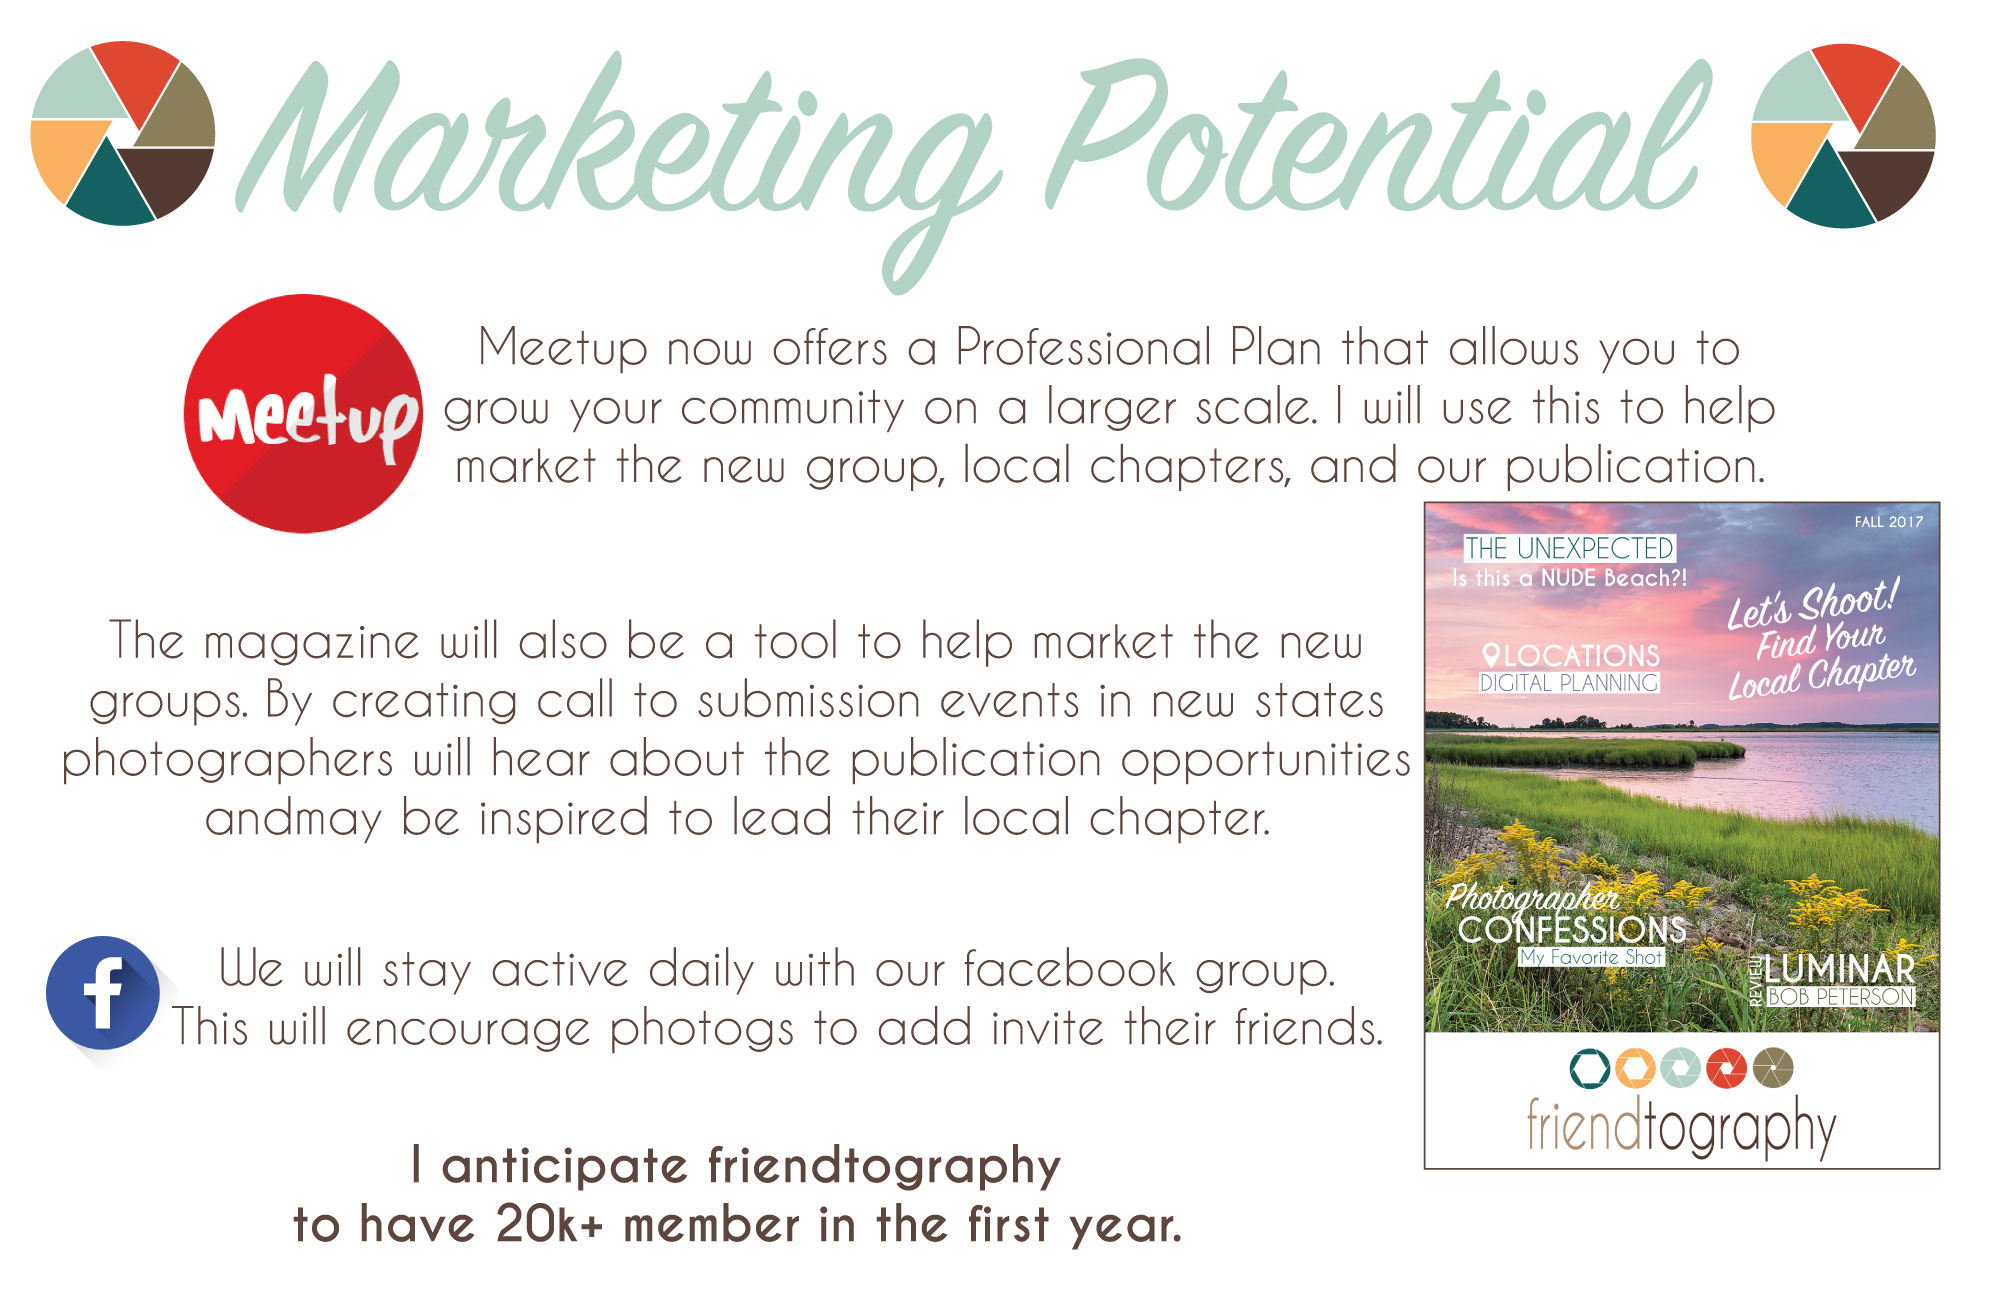 Friendtography-Marketing-Potential.jpg